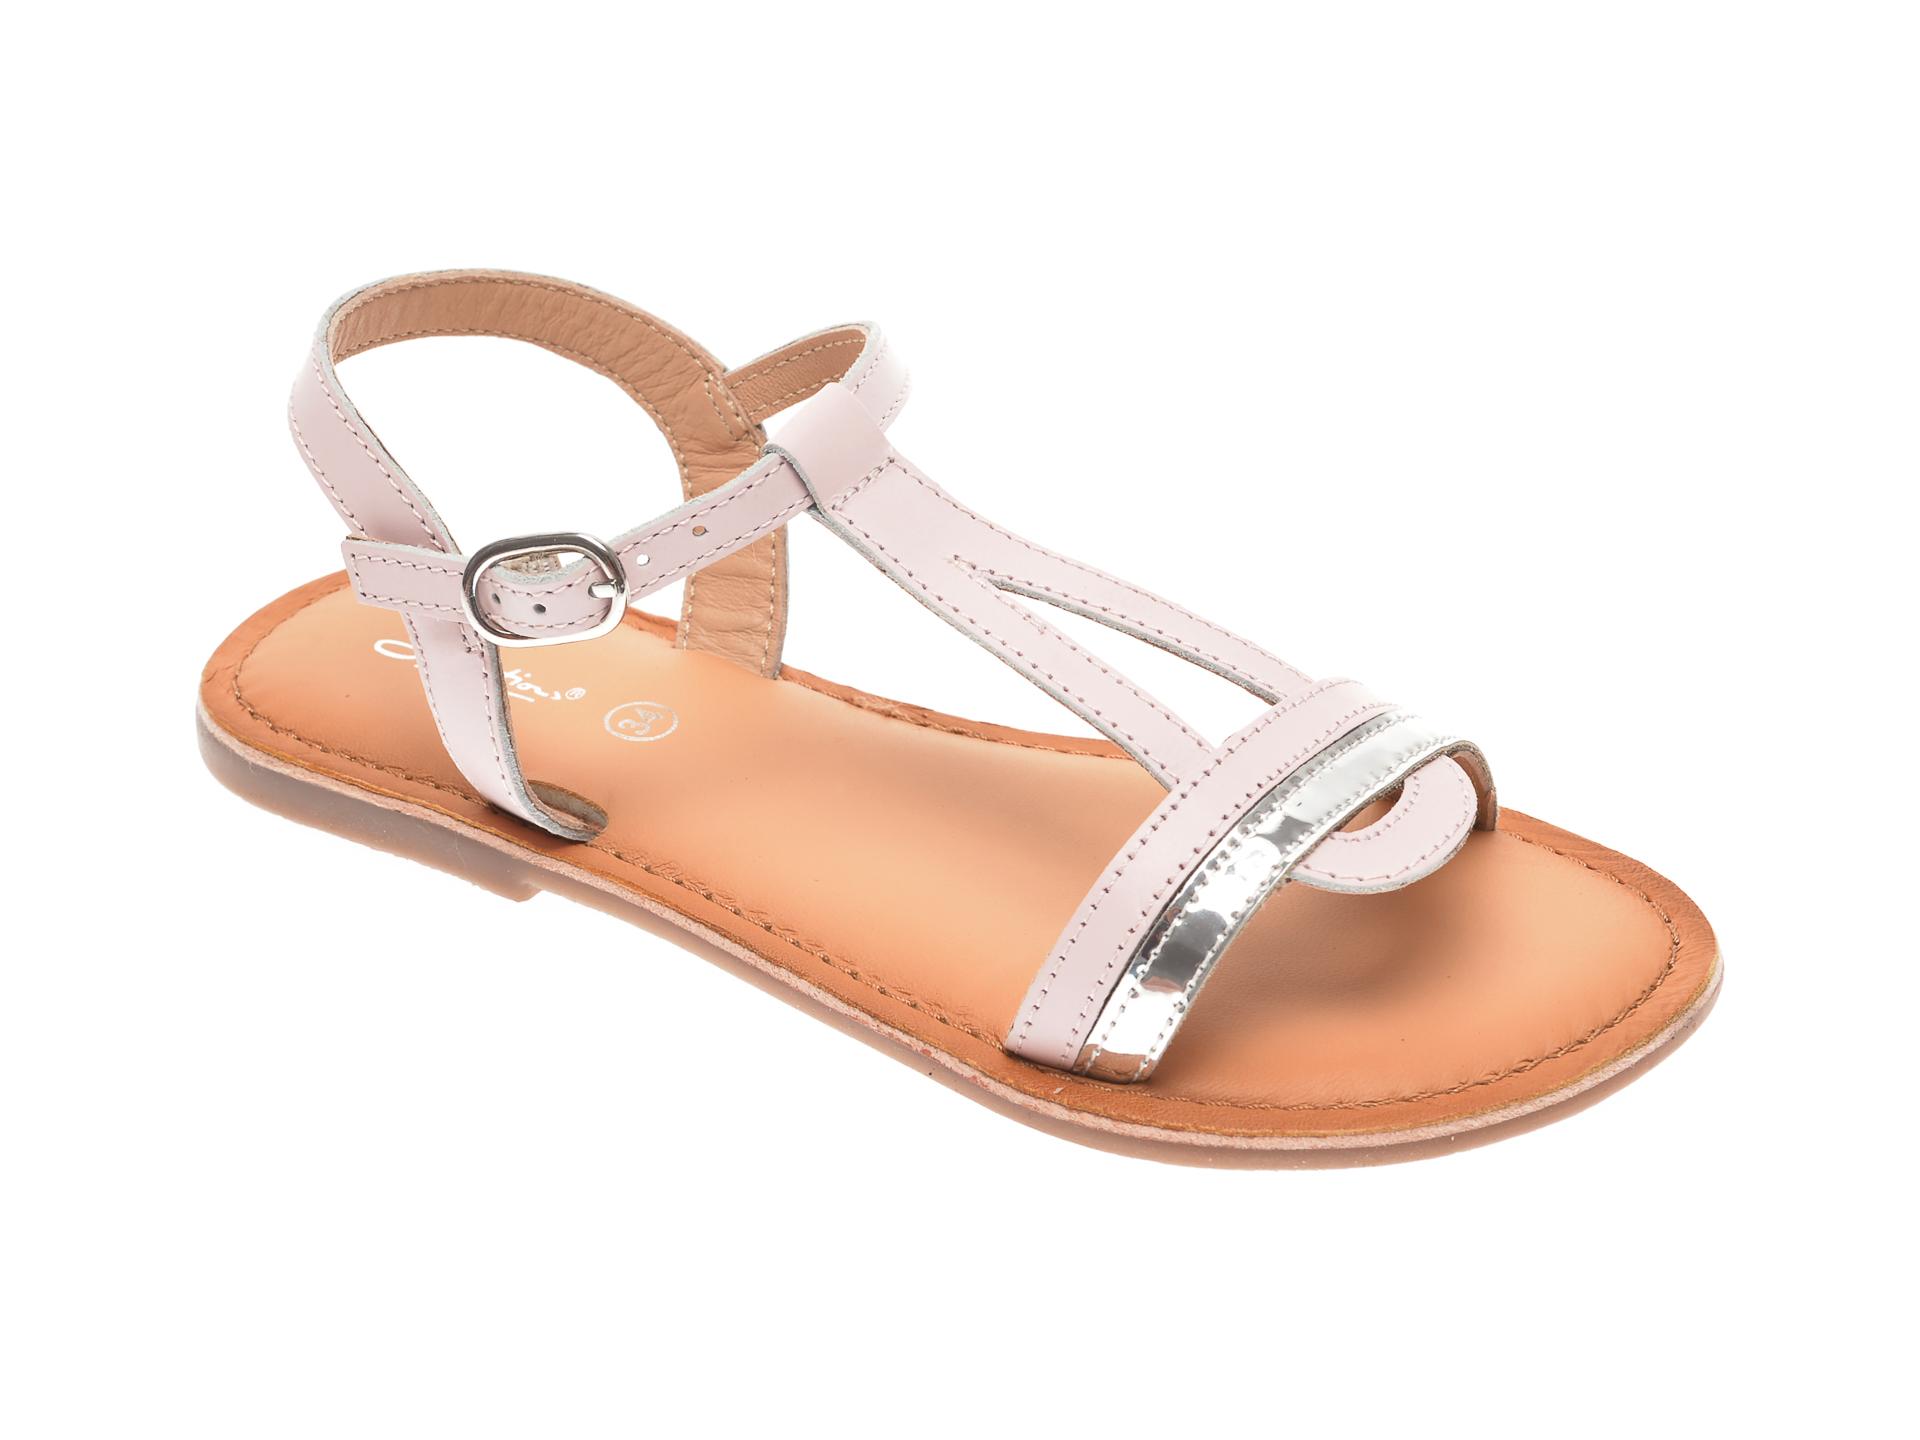 Sandale SELECTION KIDS roz, SH26, din piele naturala